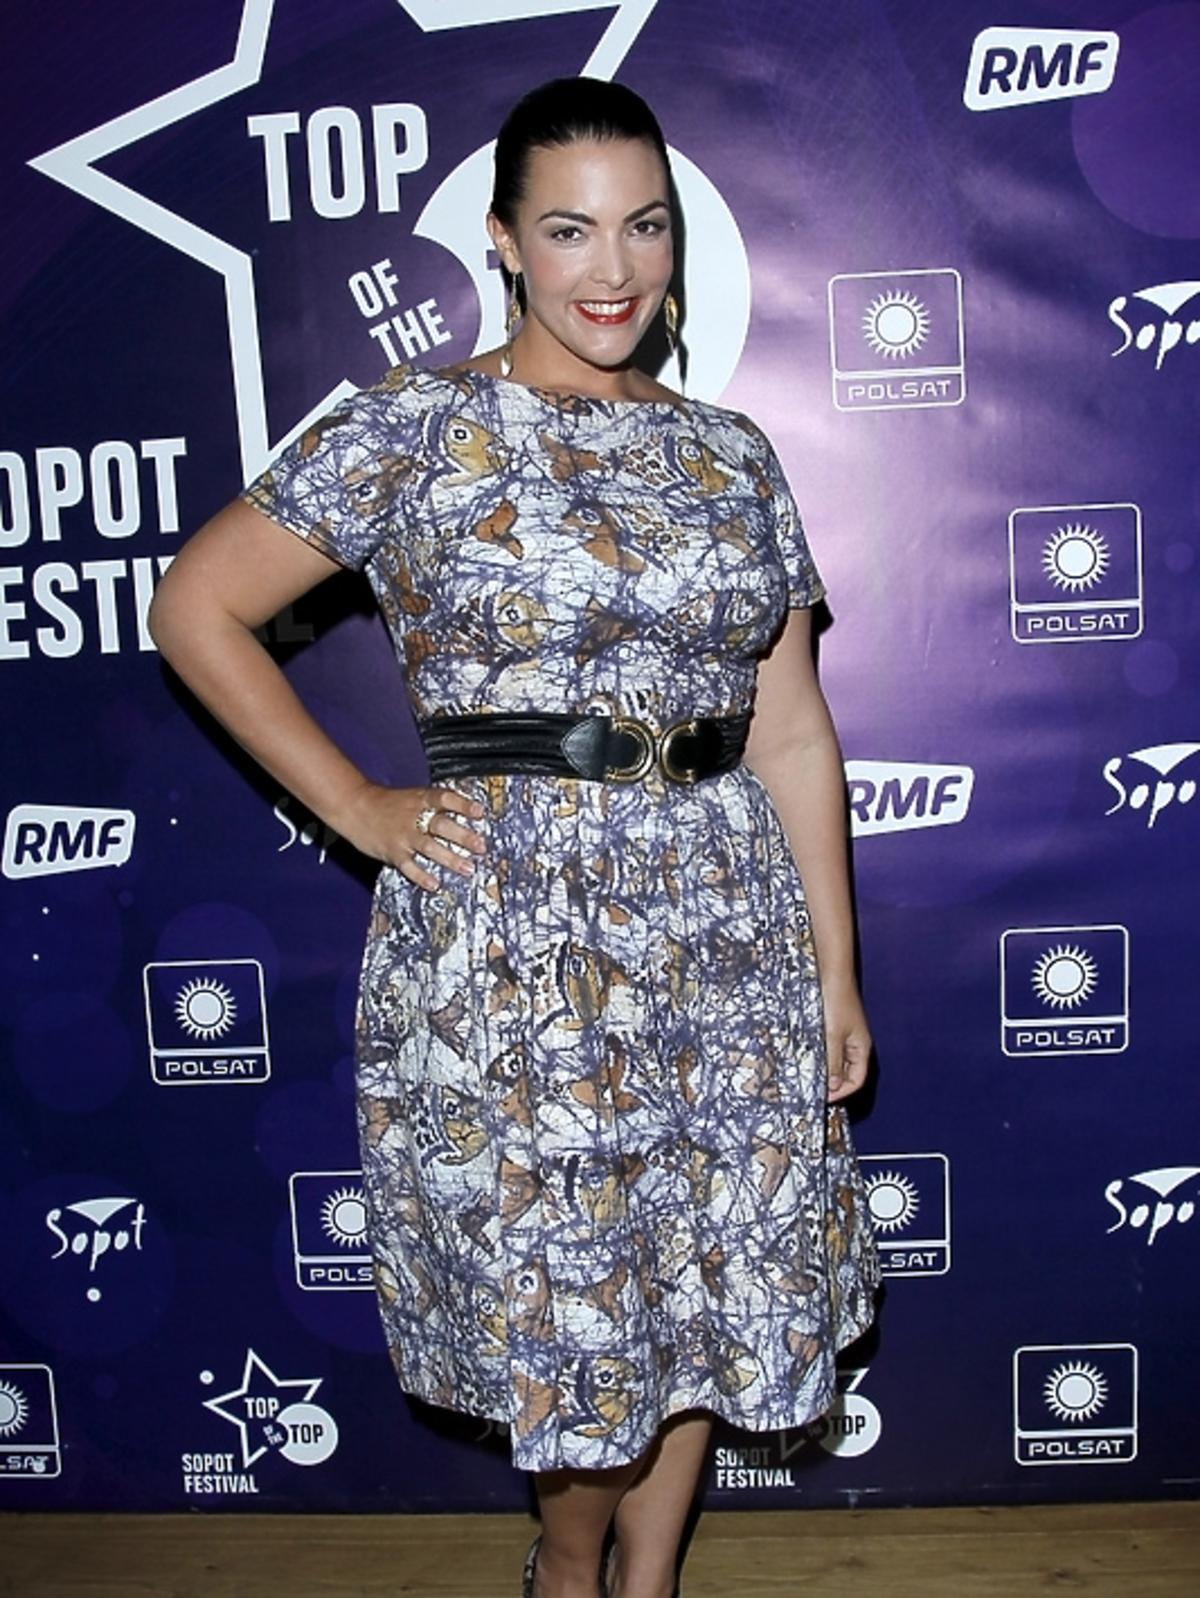 Caro Emerald podczas konferencji Sopot Top of the Top Festival 2013